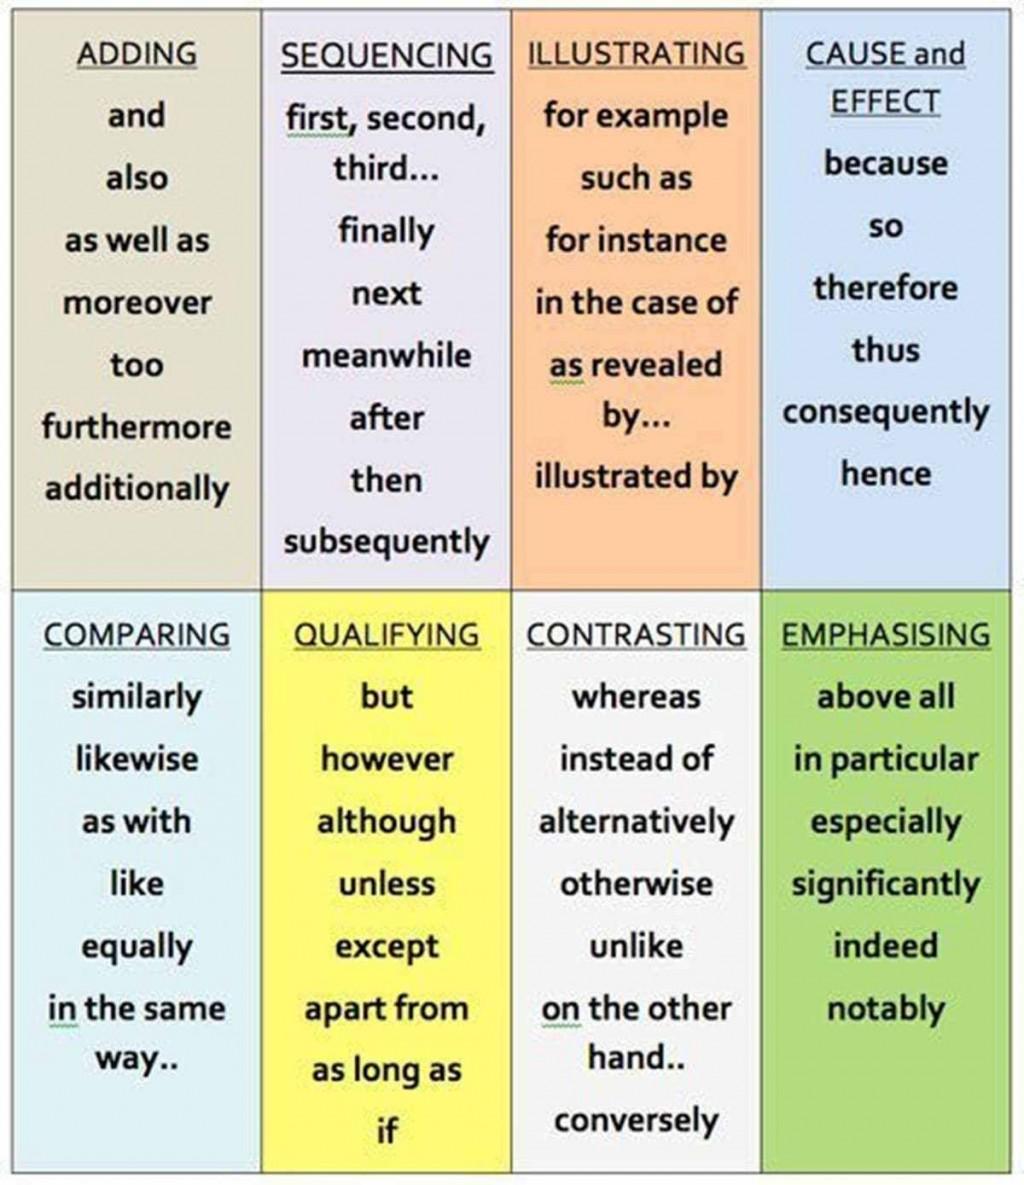 004 Essay Linking Sentences Exceptional Persuasive Sentence Words Paragraph Large